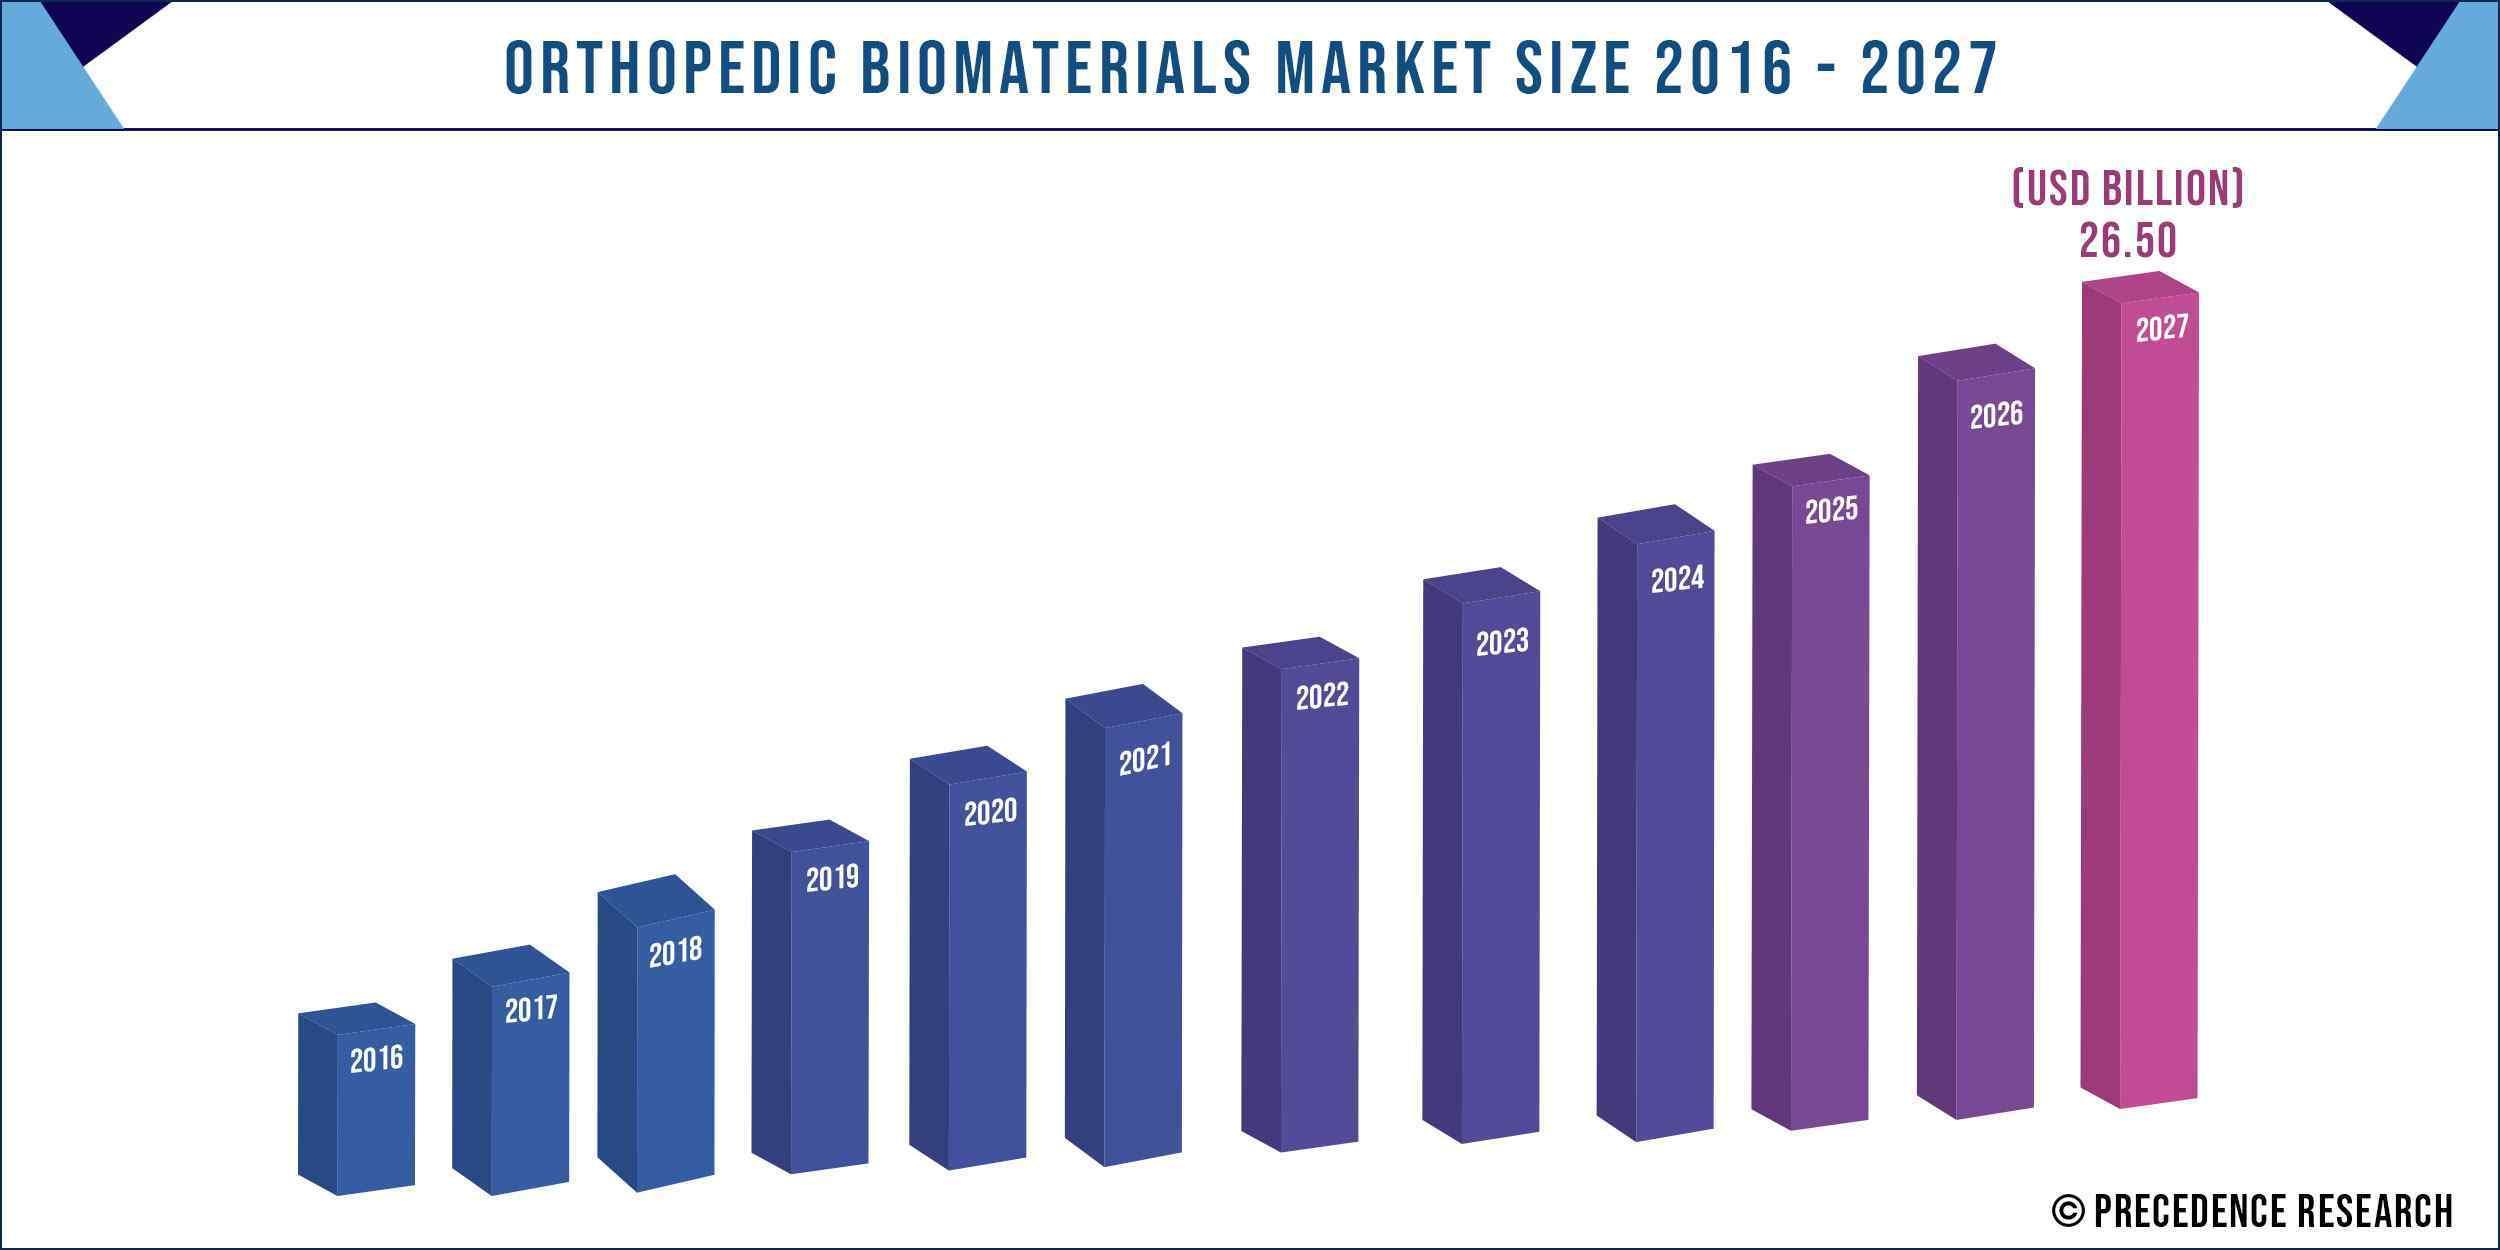 Orthopedic Biomaterials Market Size 2016 to 2027